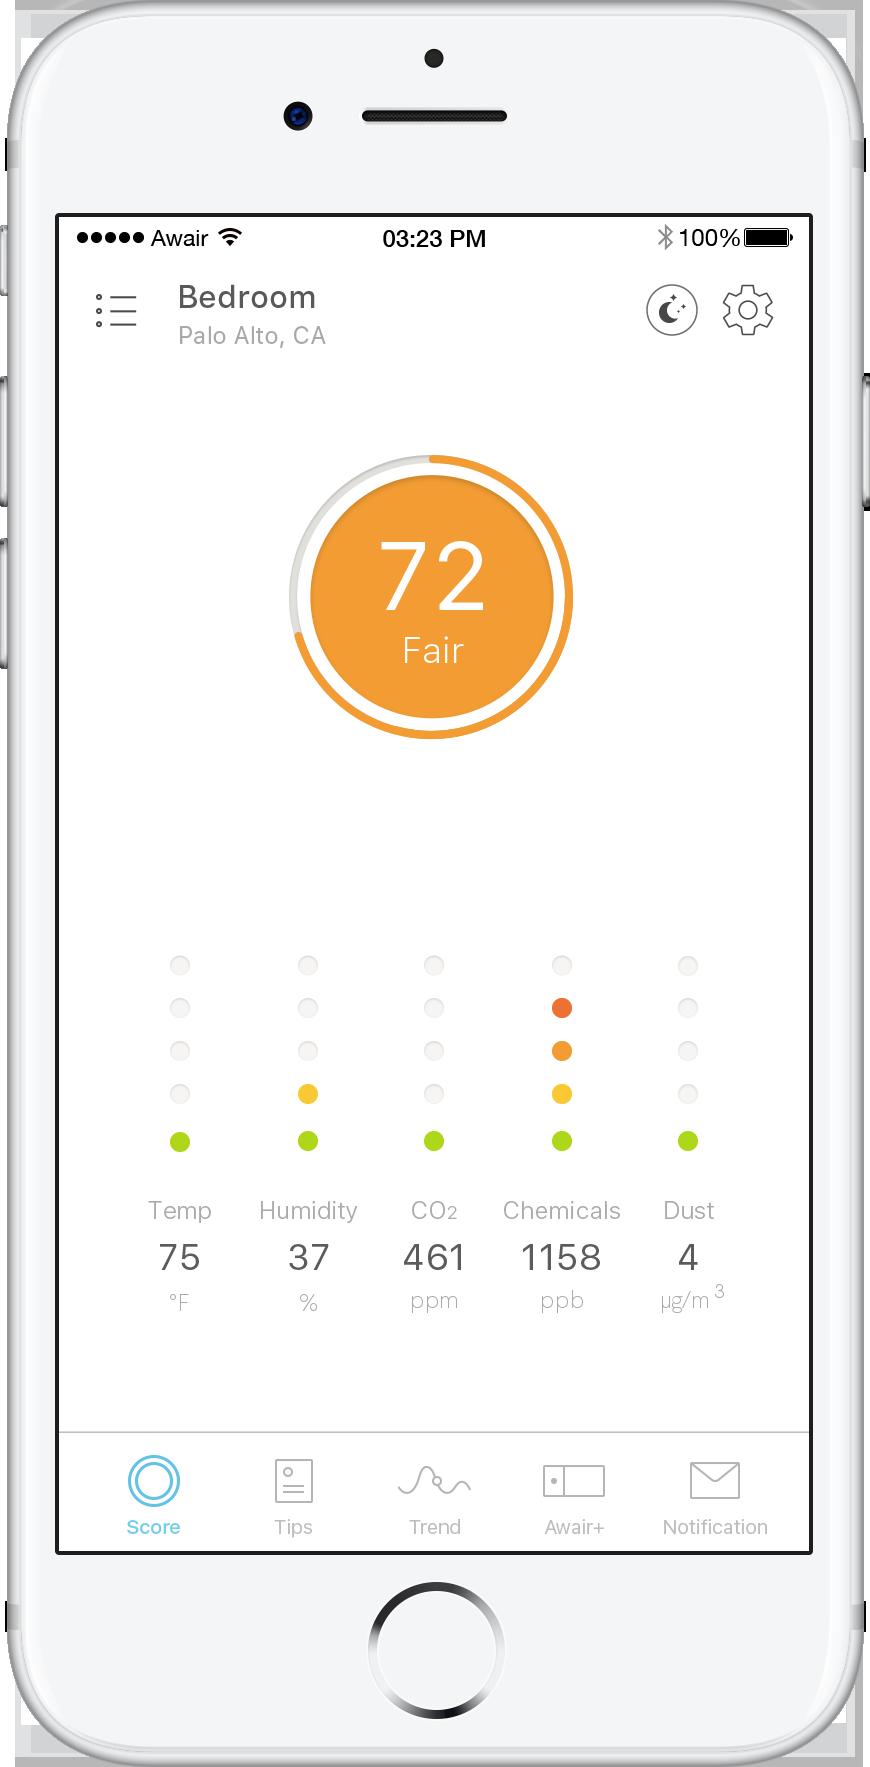 Awair App Score.png